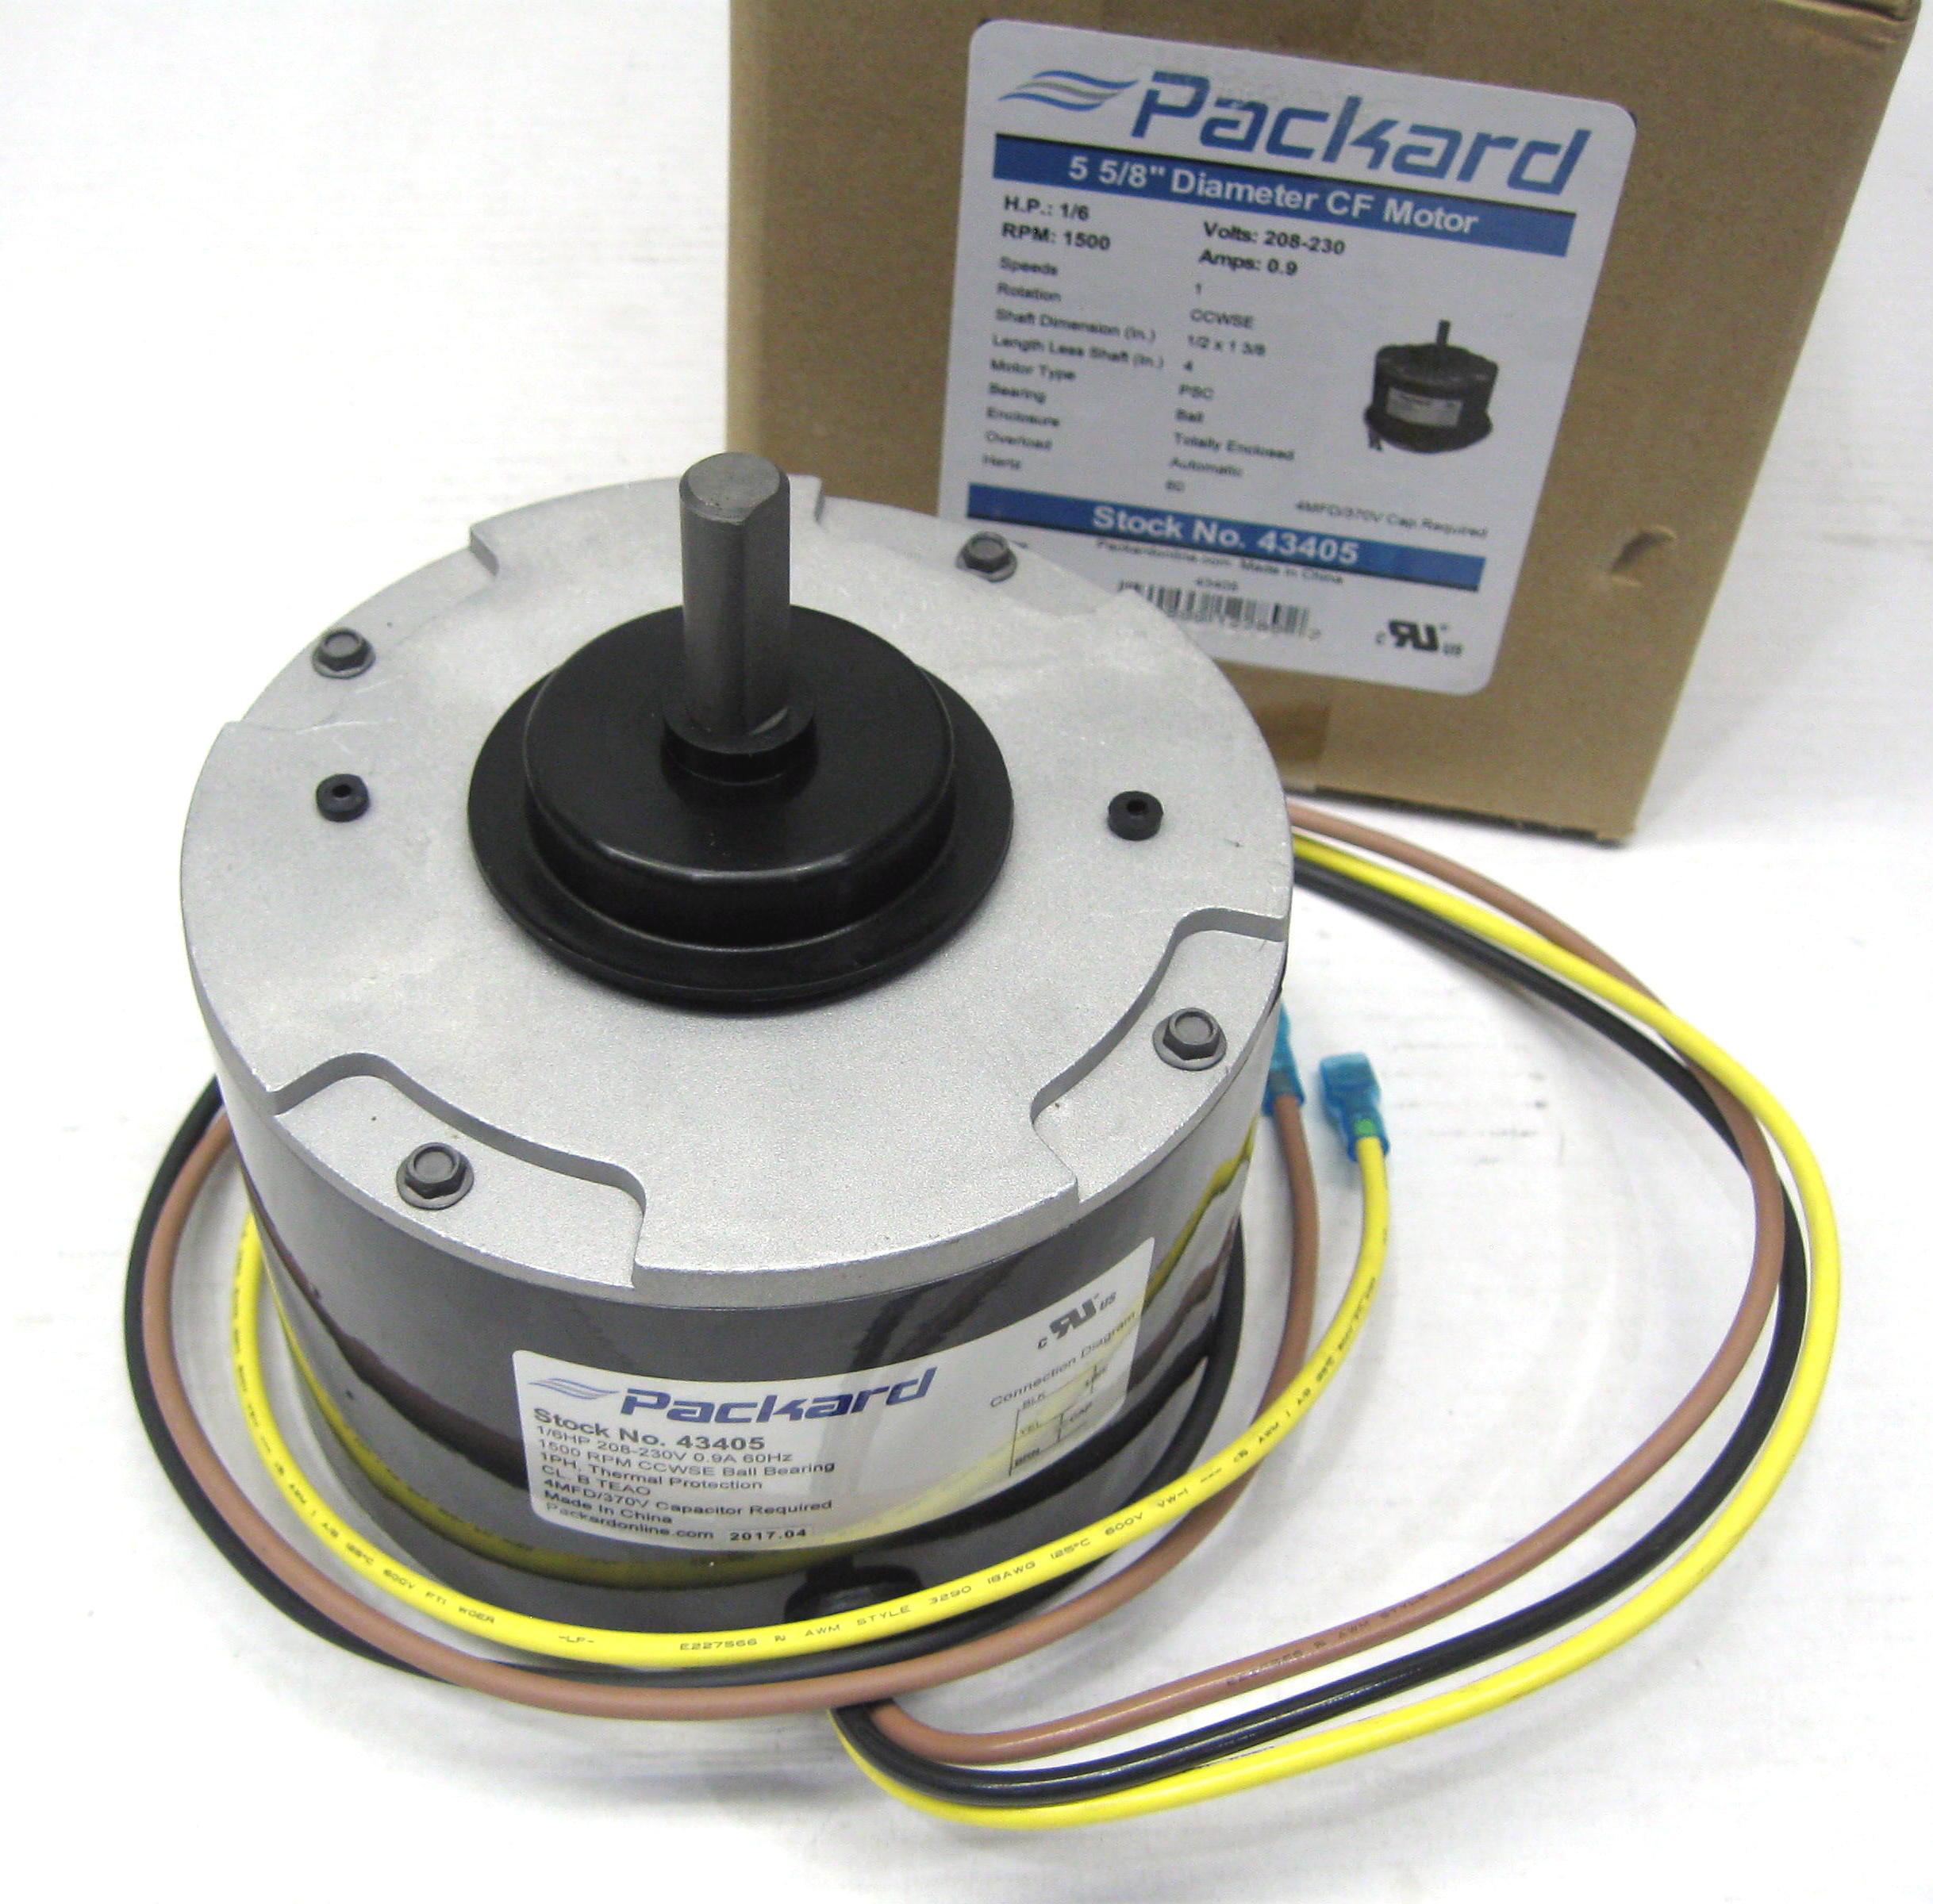 Packard Condenser Fan Motor 43405 For Carrier Hc33ge208 1 6hp 1500 Tcas Wiring Diagram Rpm 208 230 Volts